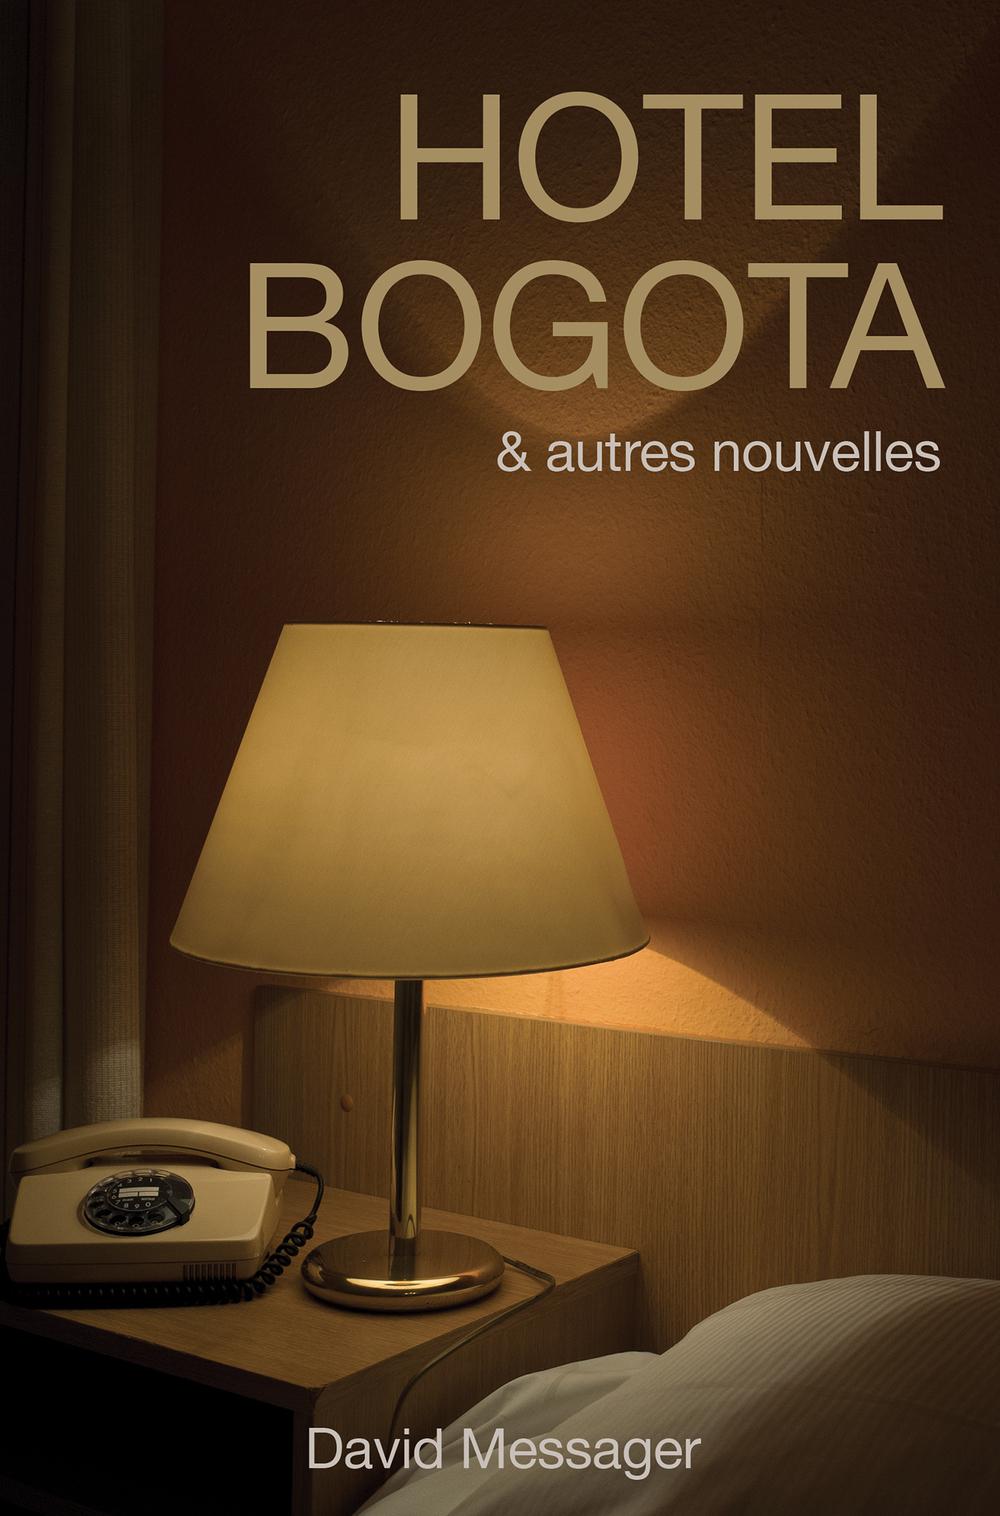 Hotel Bogota